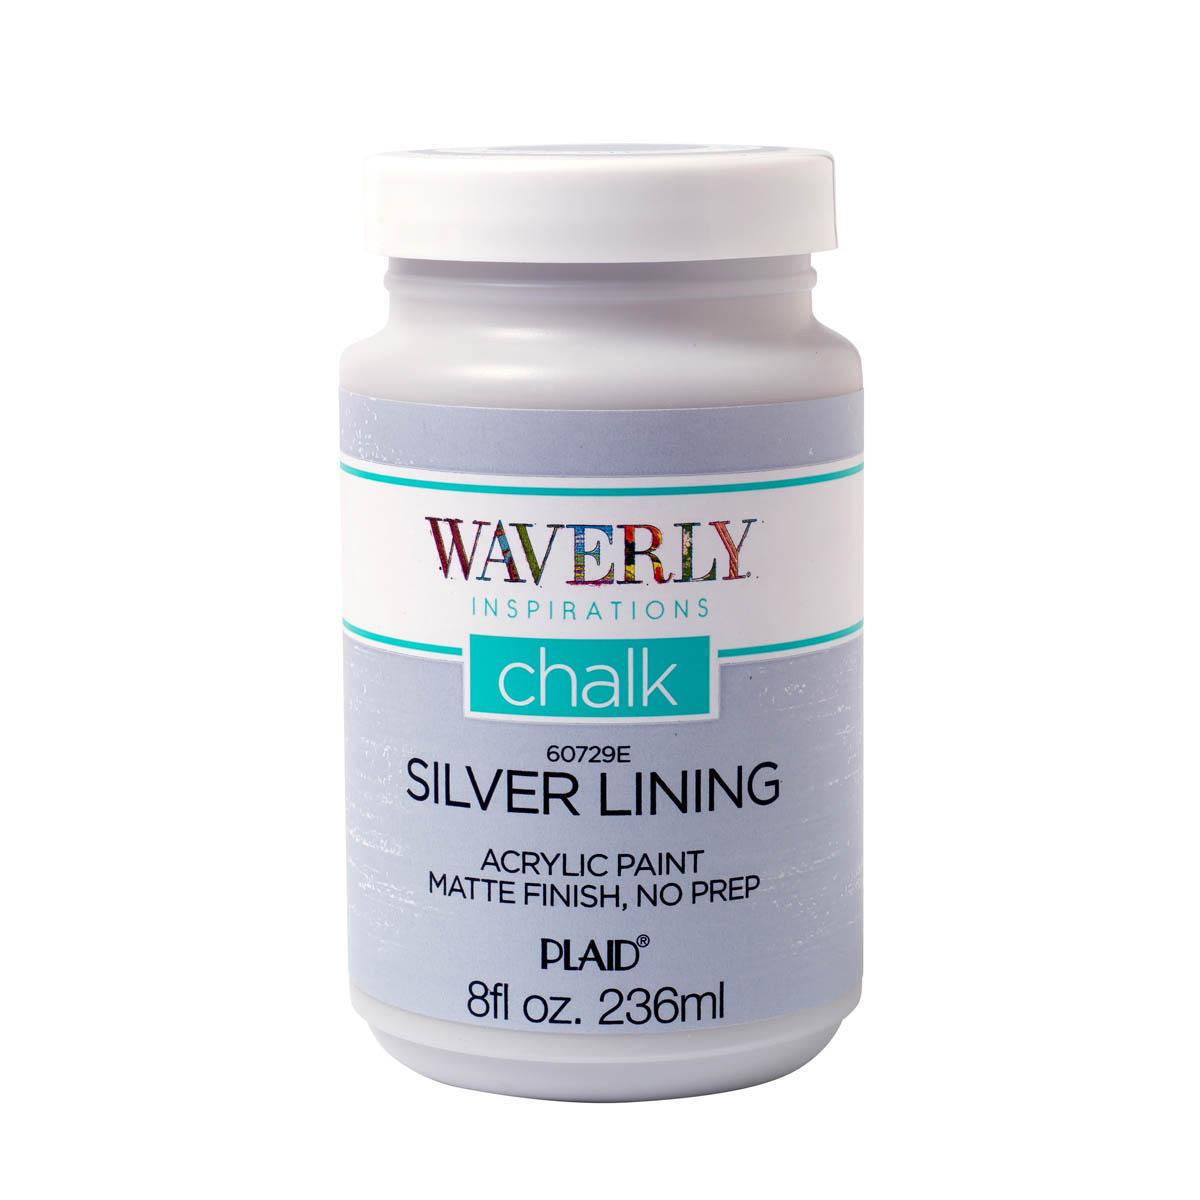 Waverly ® Inspirations Chalk Acrylic Paint - Silver Lining, 8 oz.